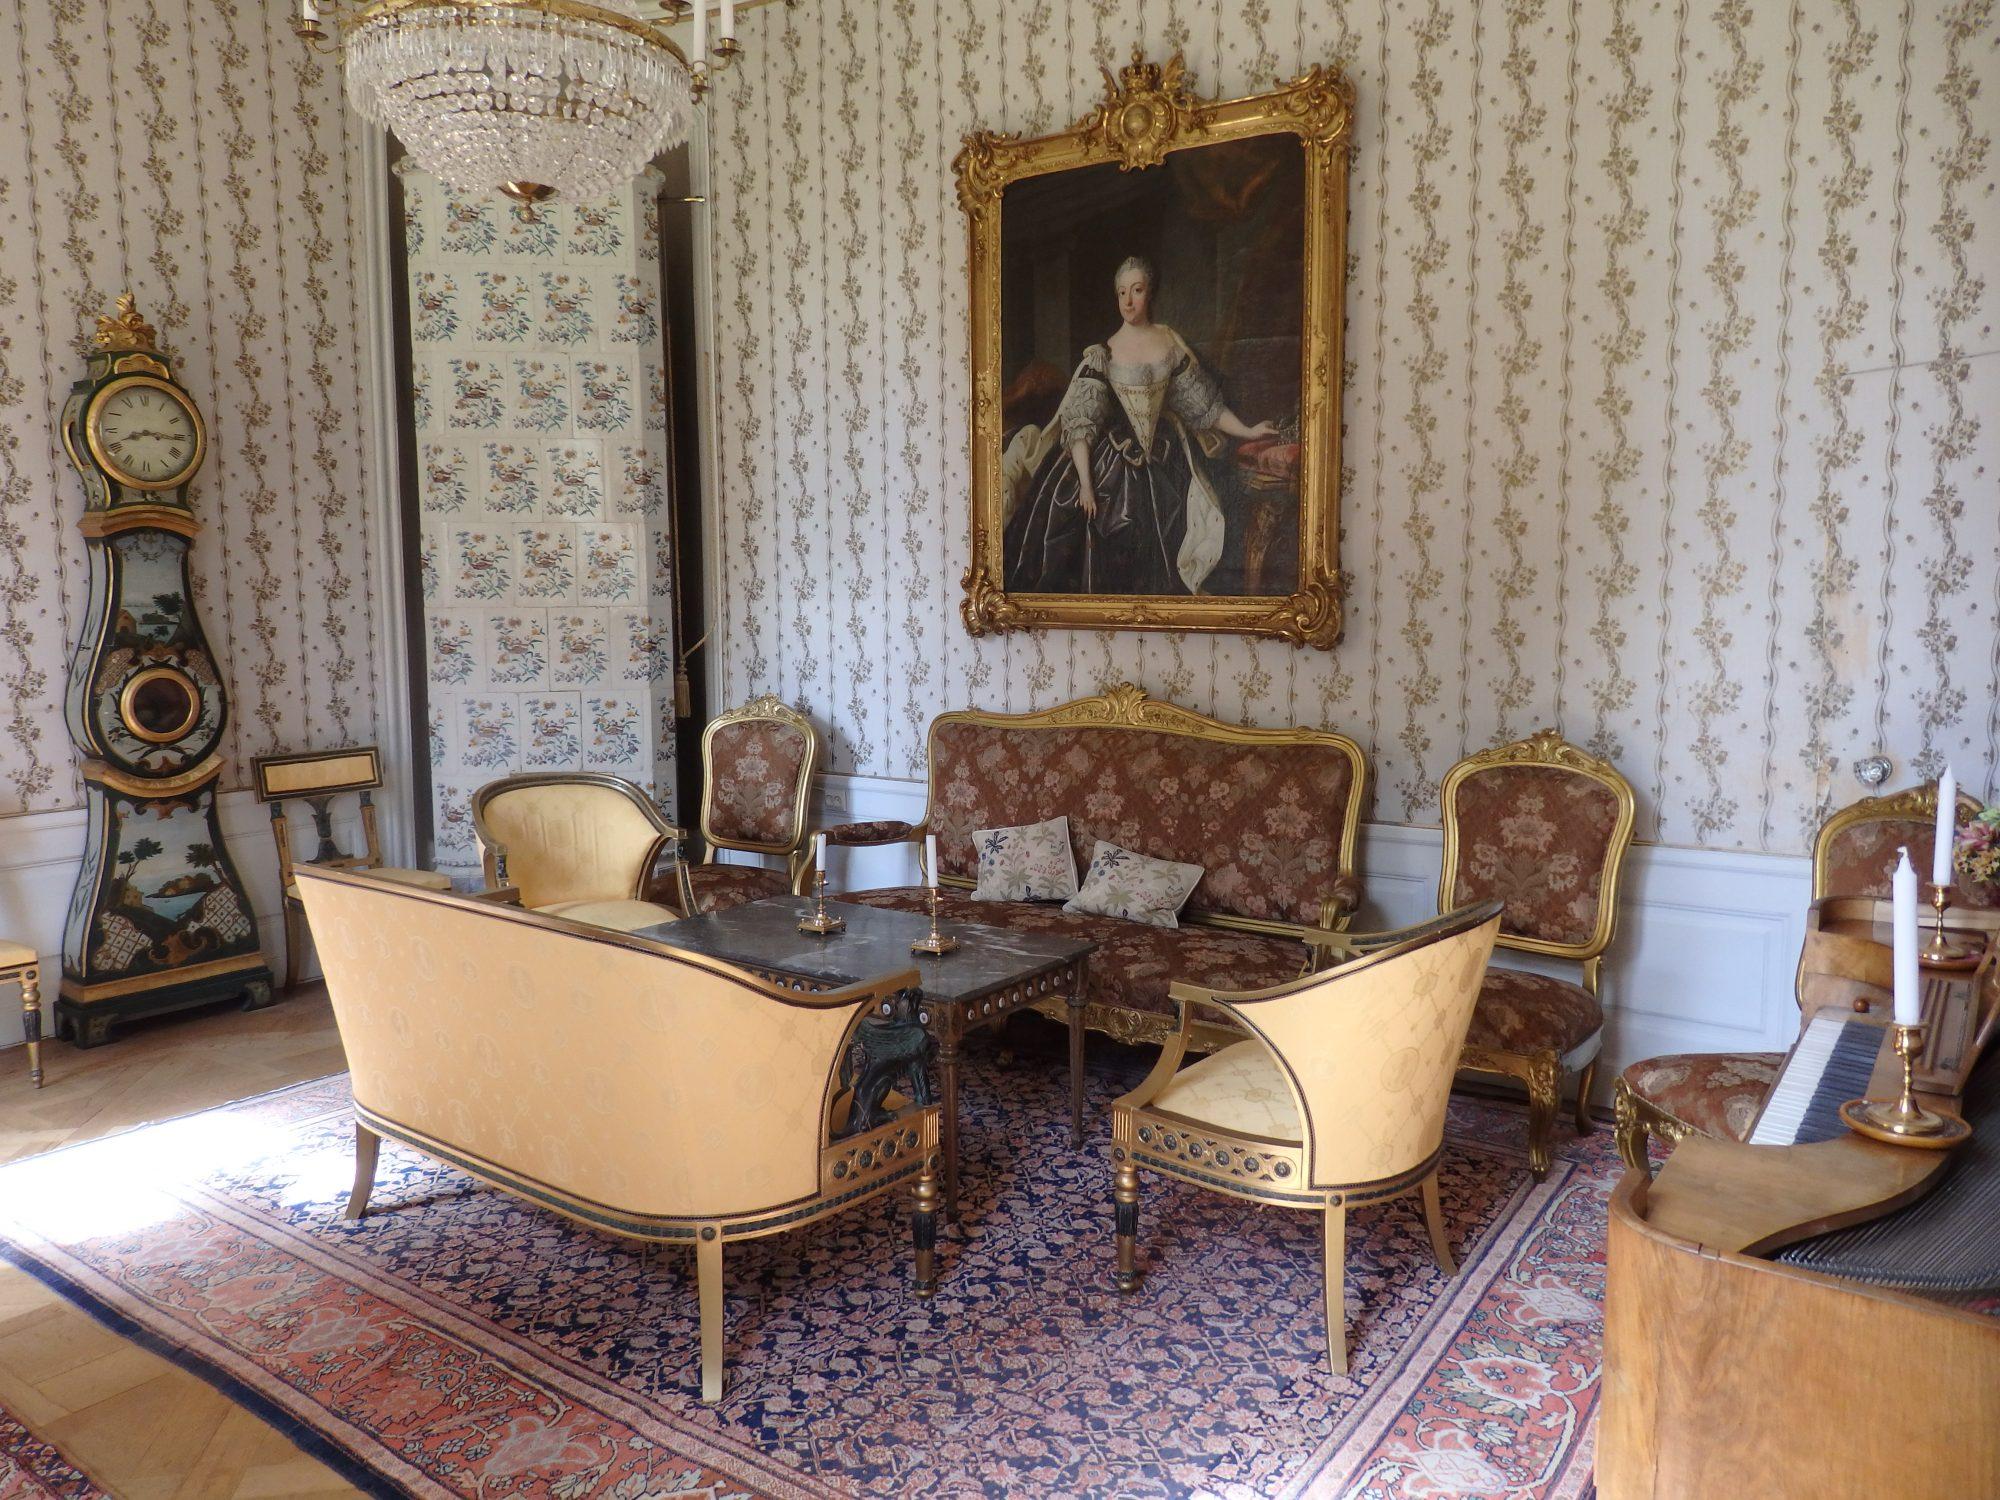 one of many lovely rooms inside Sparreholms manor, Sormland, Sweden